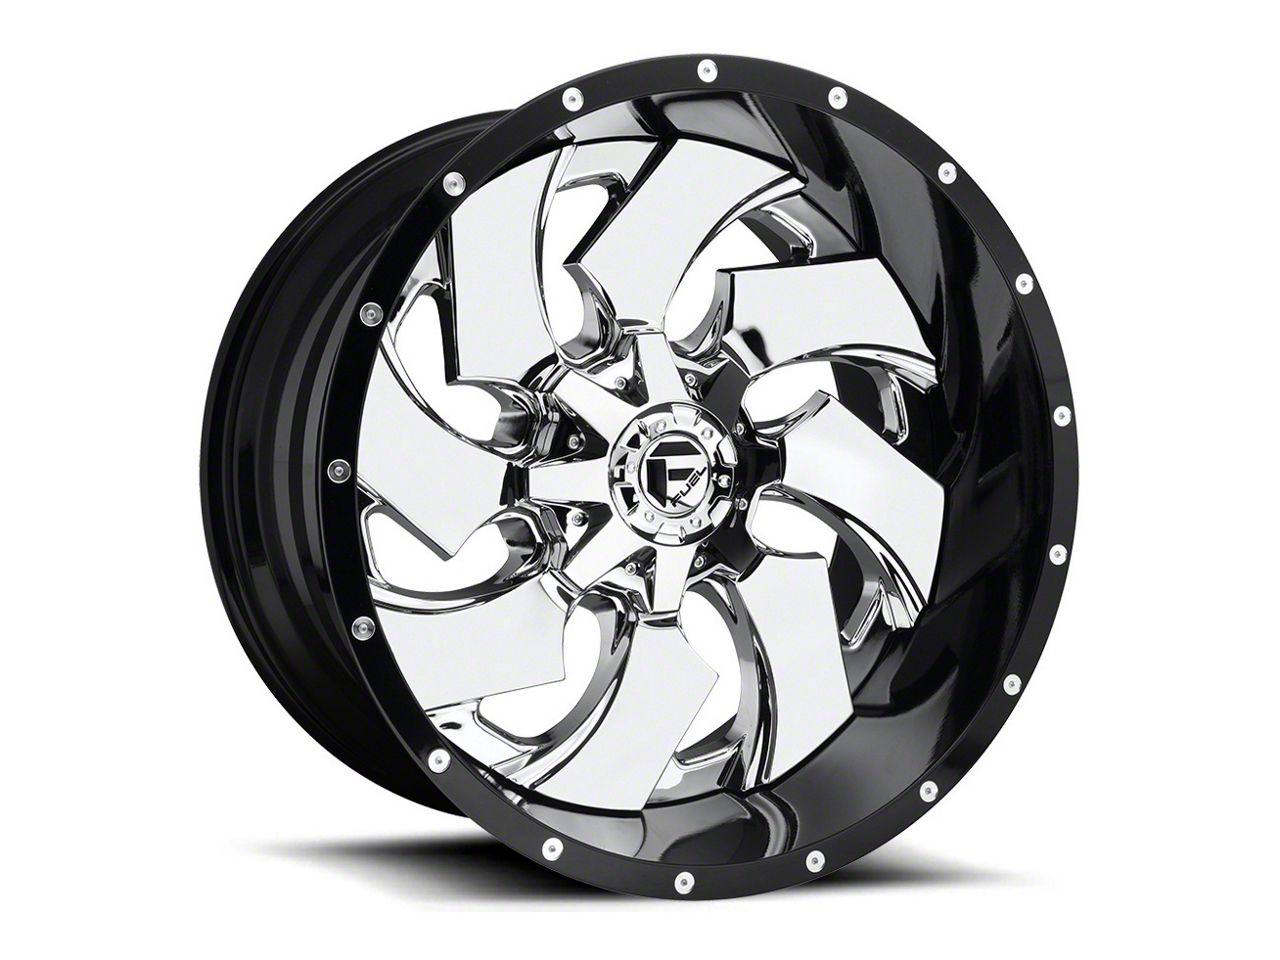 Fuel Wheels Cleaver 2-Piece Chrome 6-Lug Wheel - 20x12 (07-18 Sierra 1500)